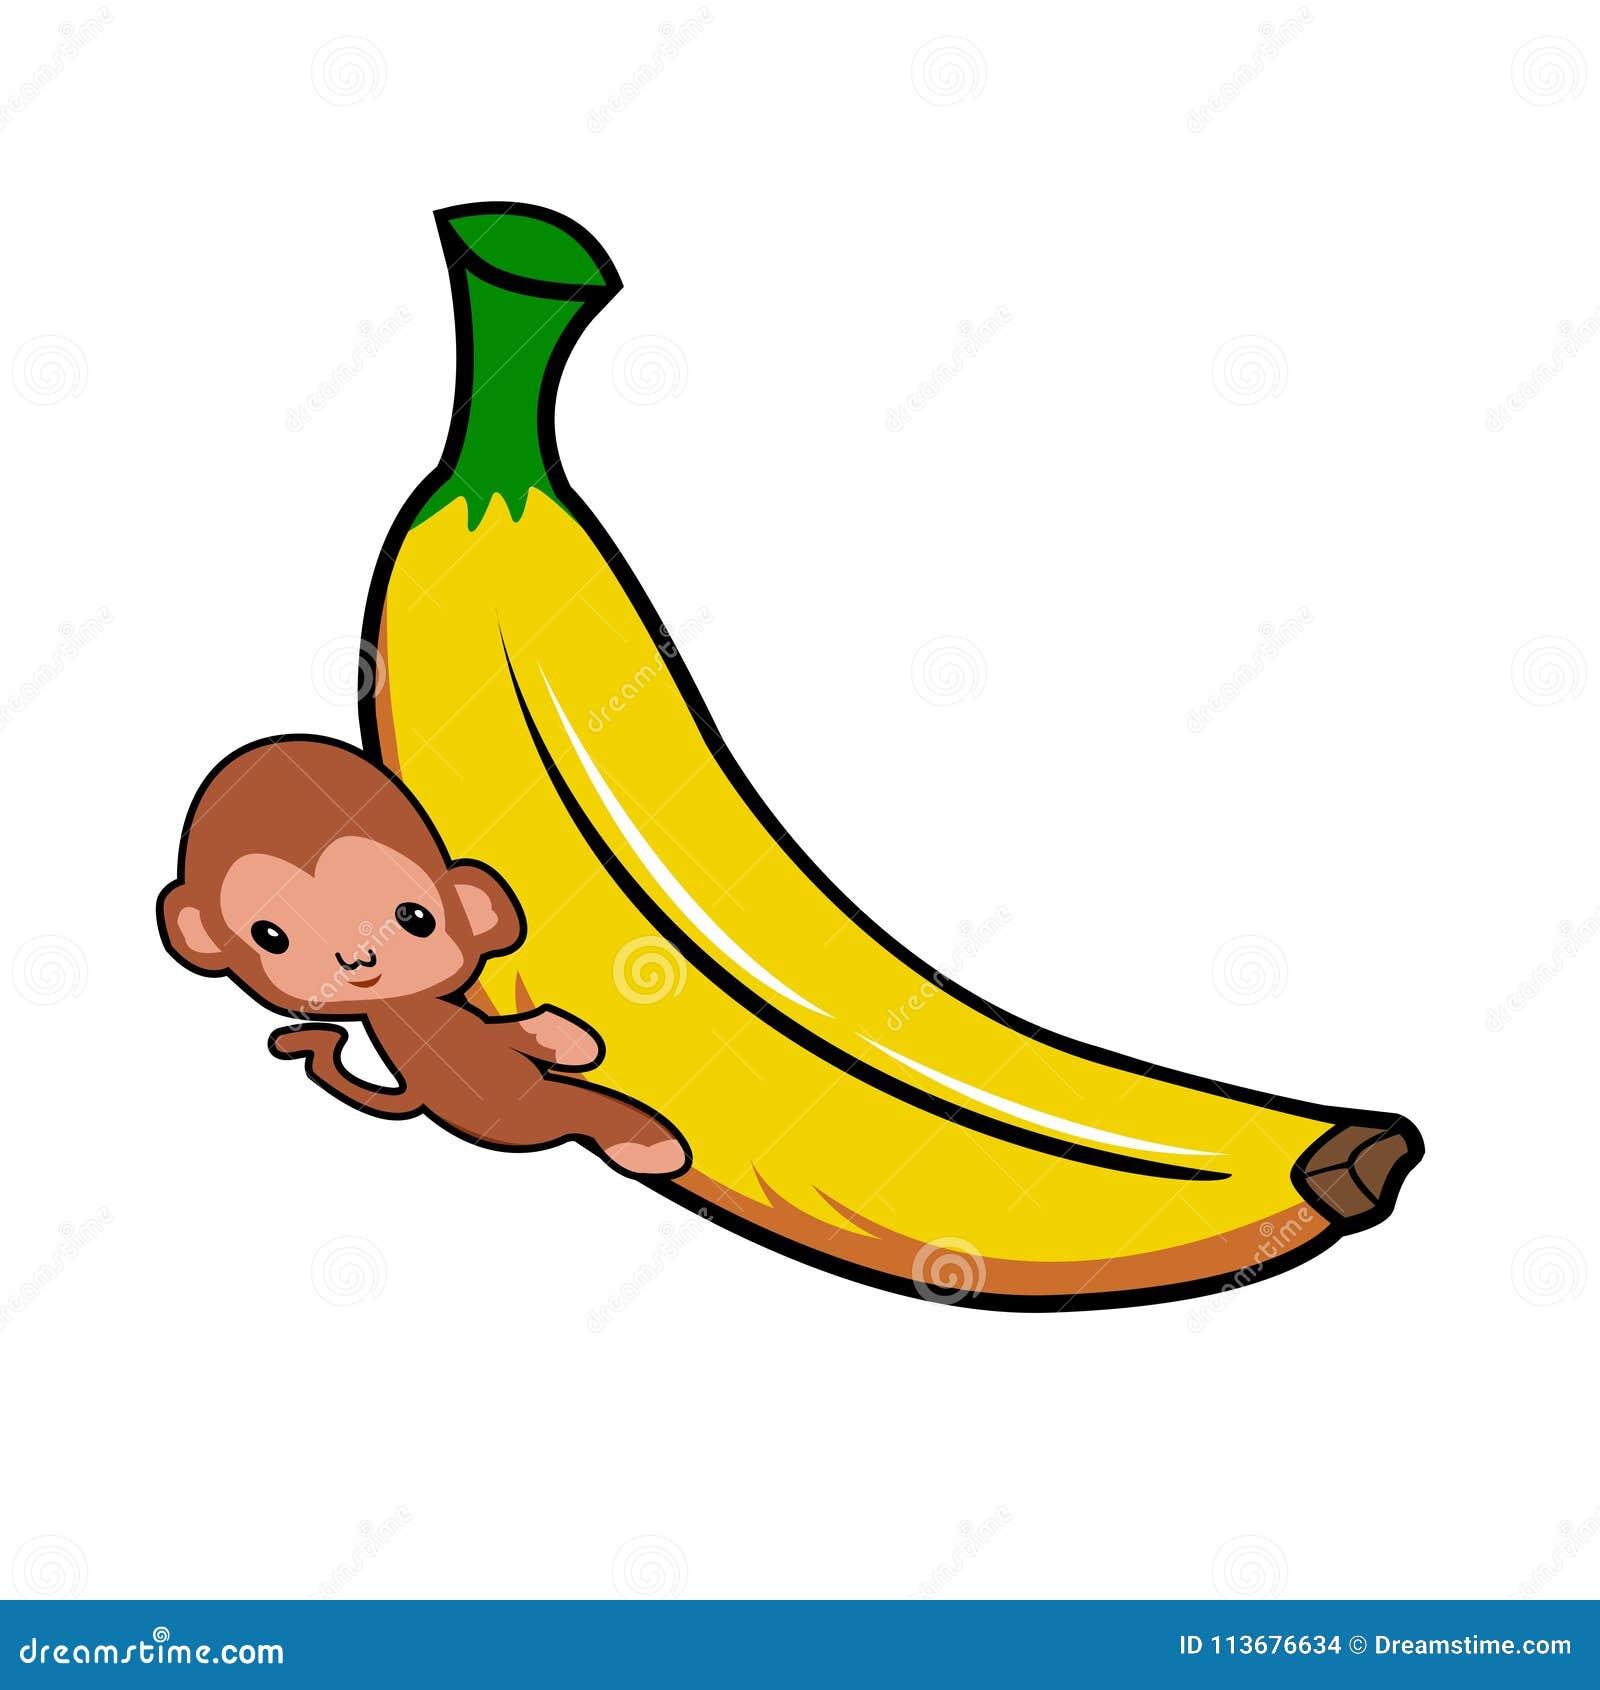 Banana And Monkey Is Hugging Stock Vector Illustration Of Hugging